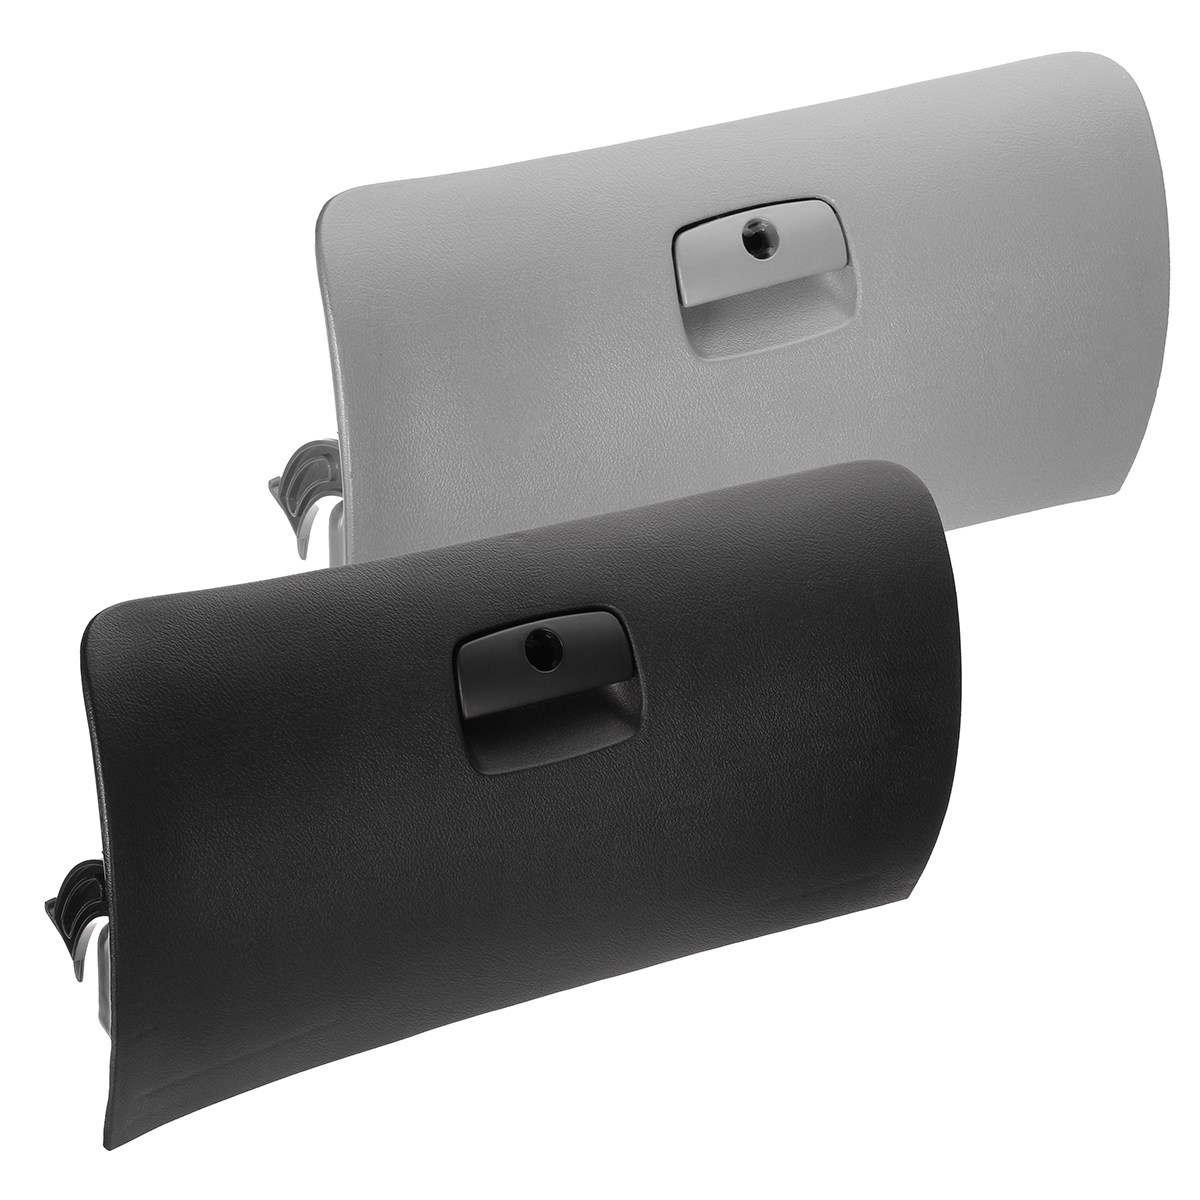 Car Glove Box Door Lid Cover Black For Passat Estate B5 & B5.5 1997-2005 Black Grey